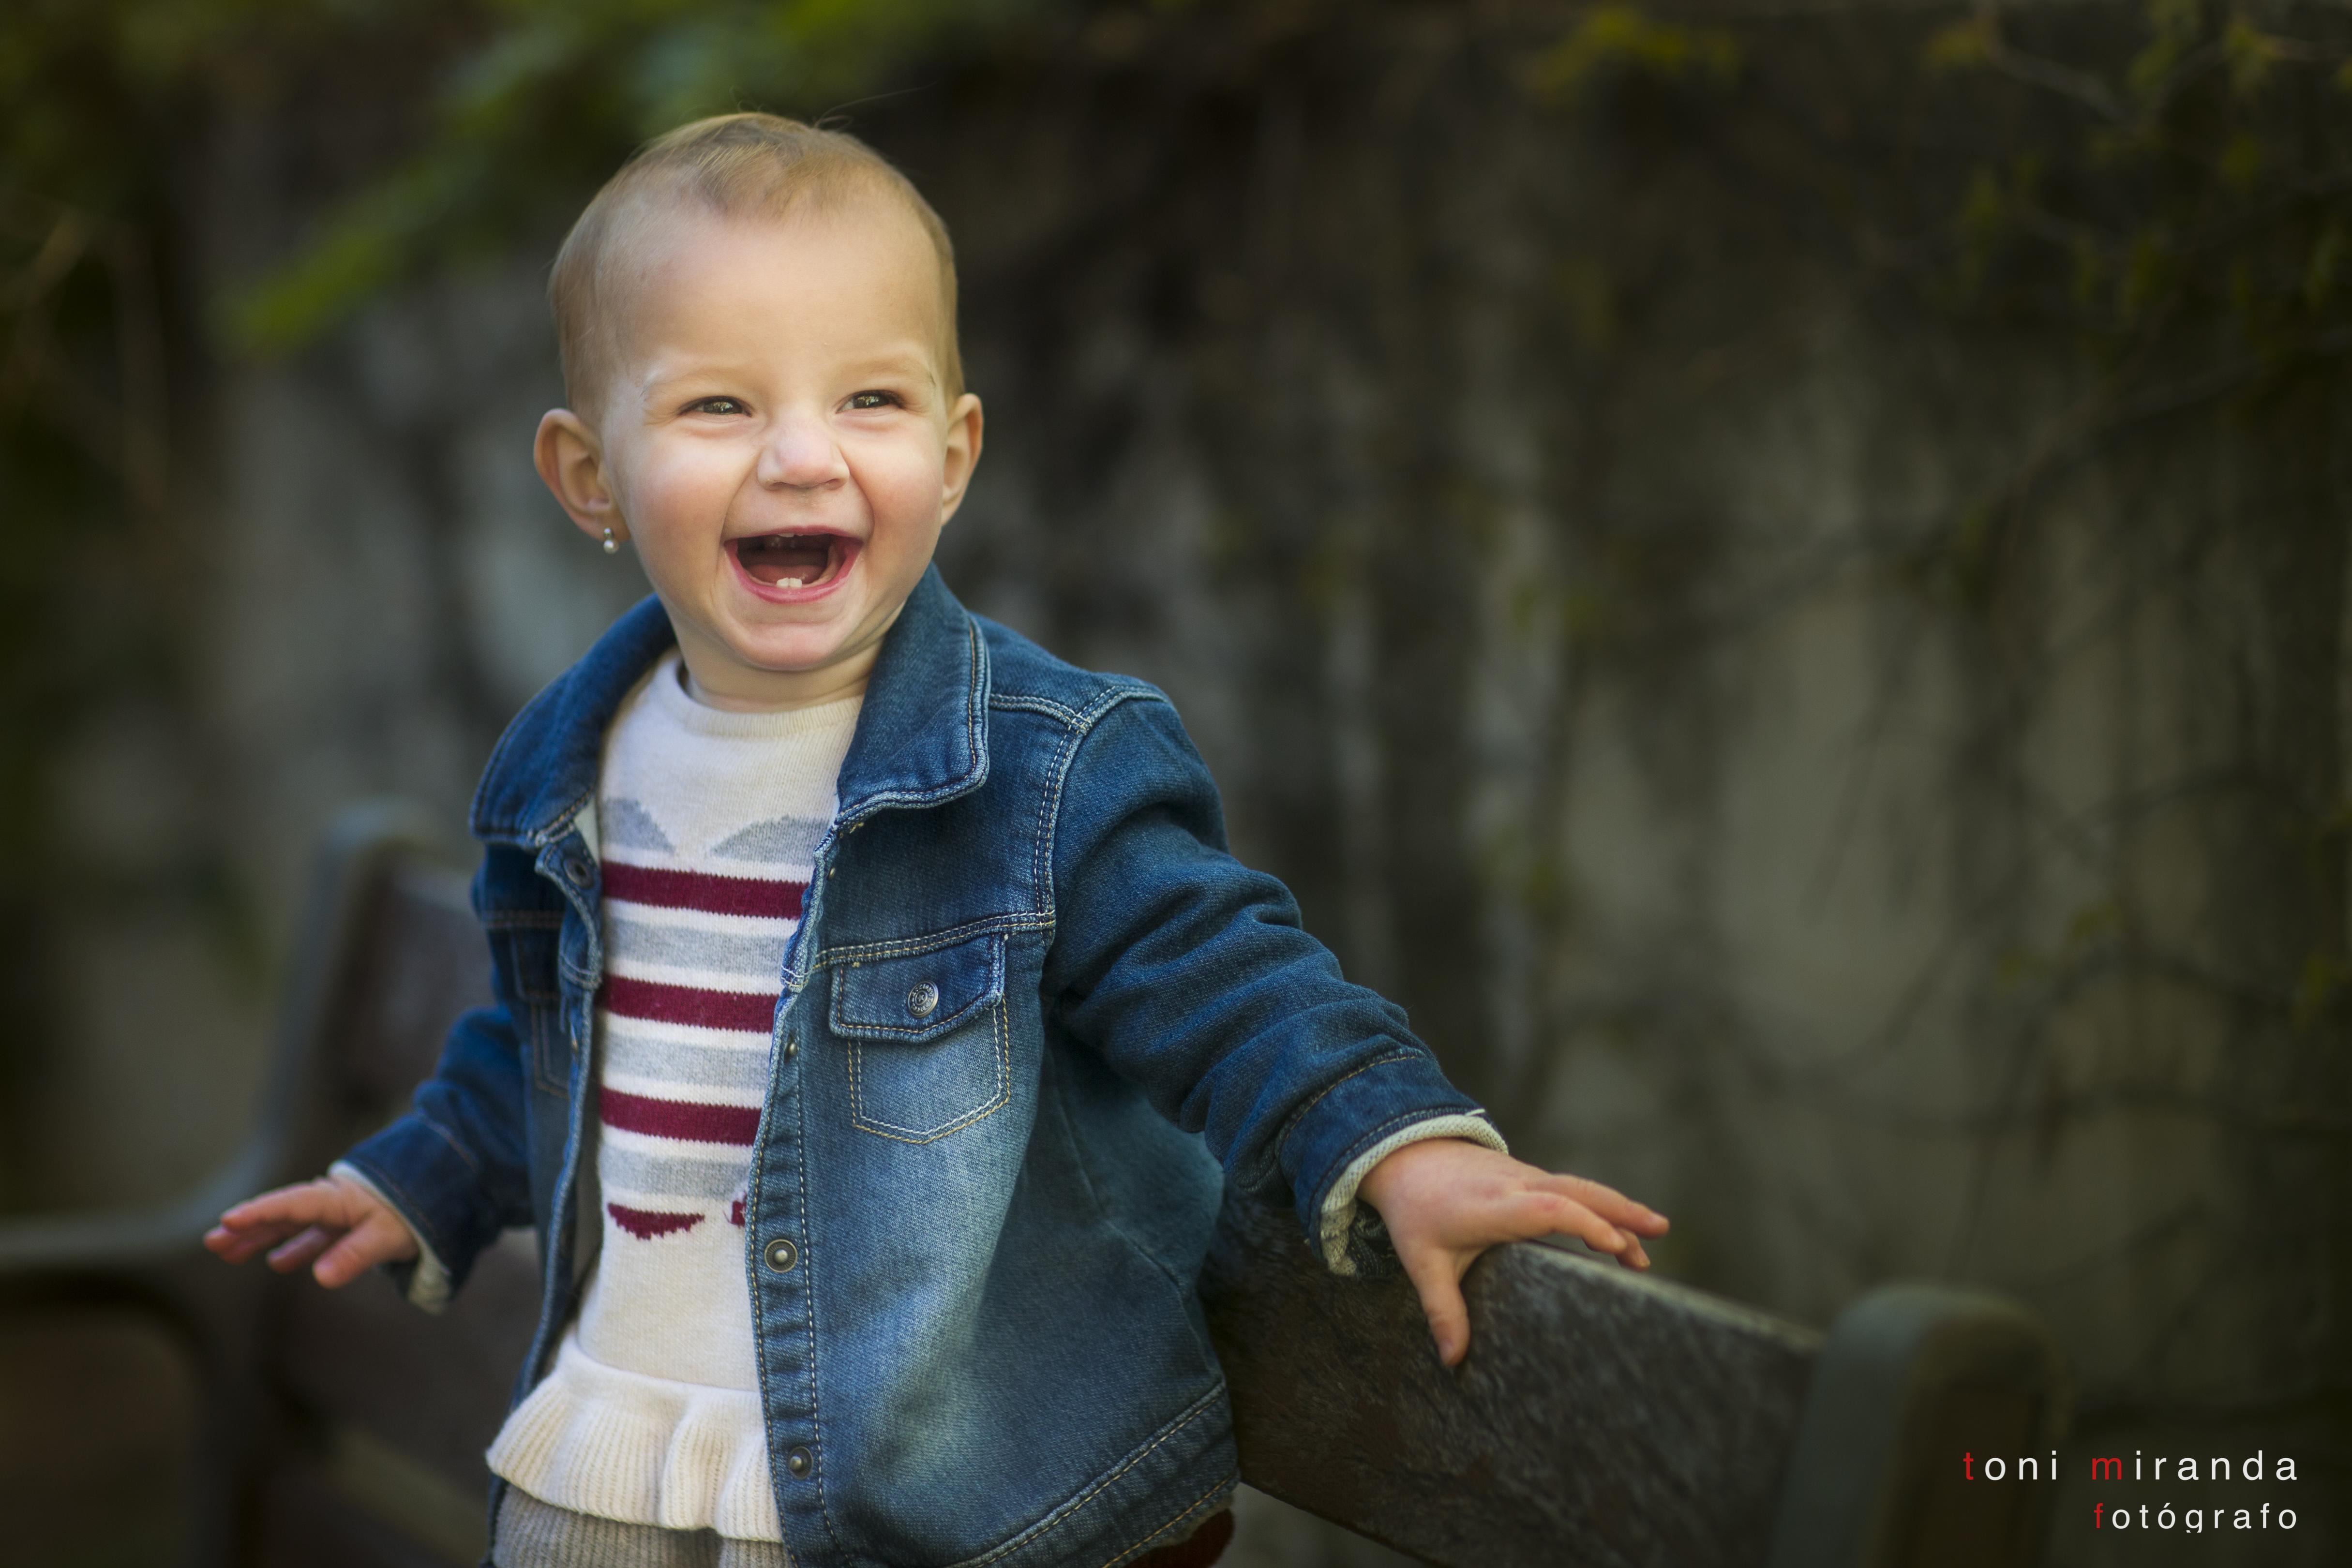 fotografia de bebe en exteriores con luz natural